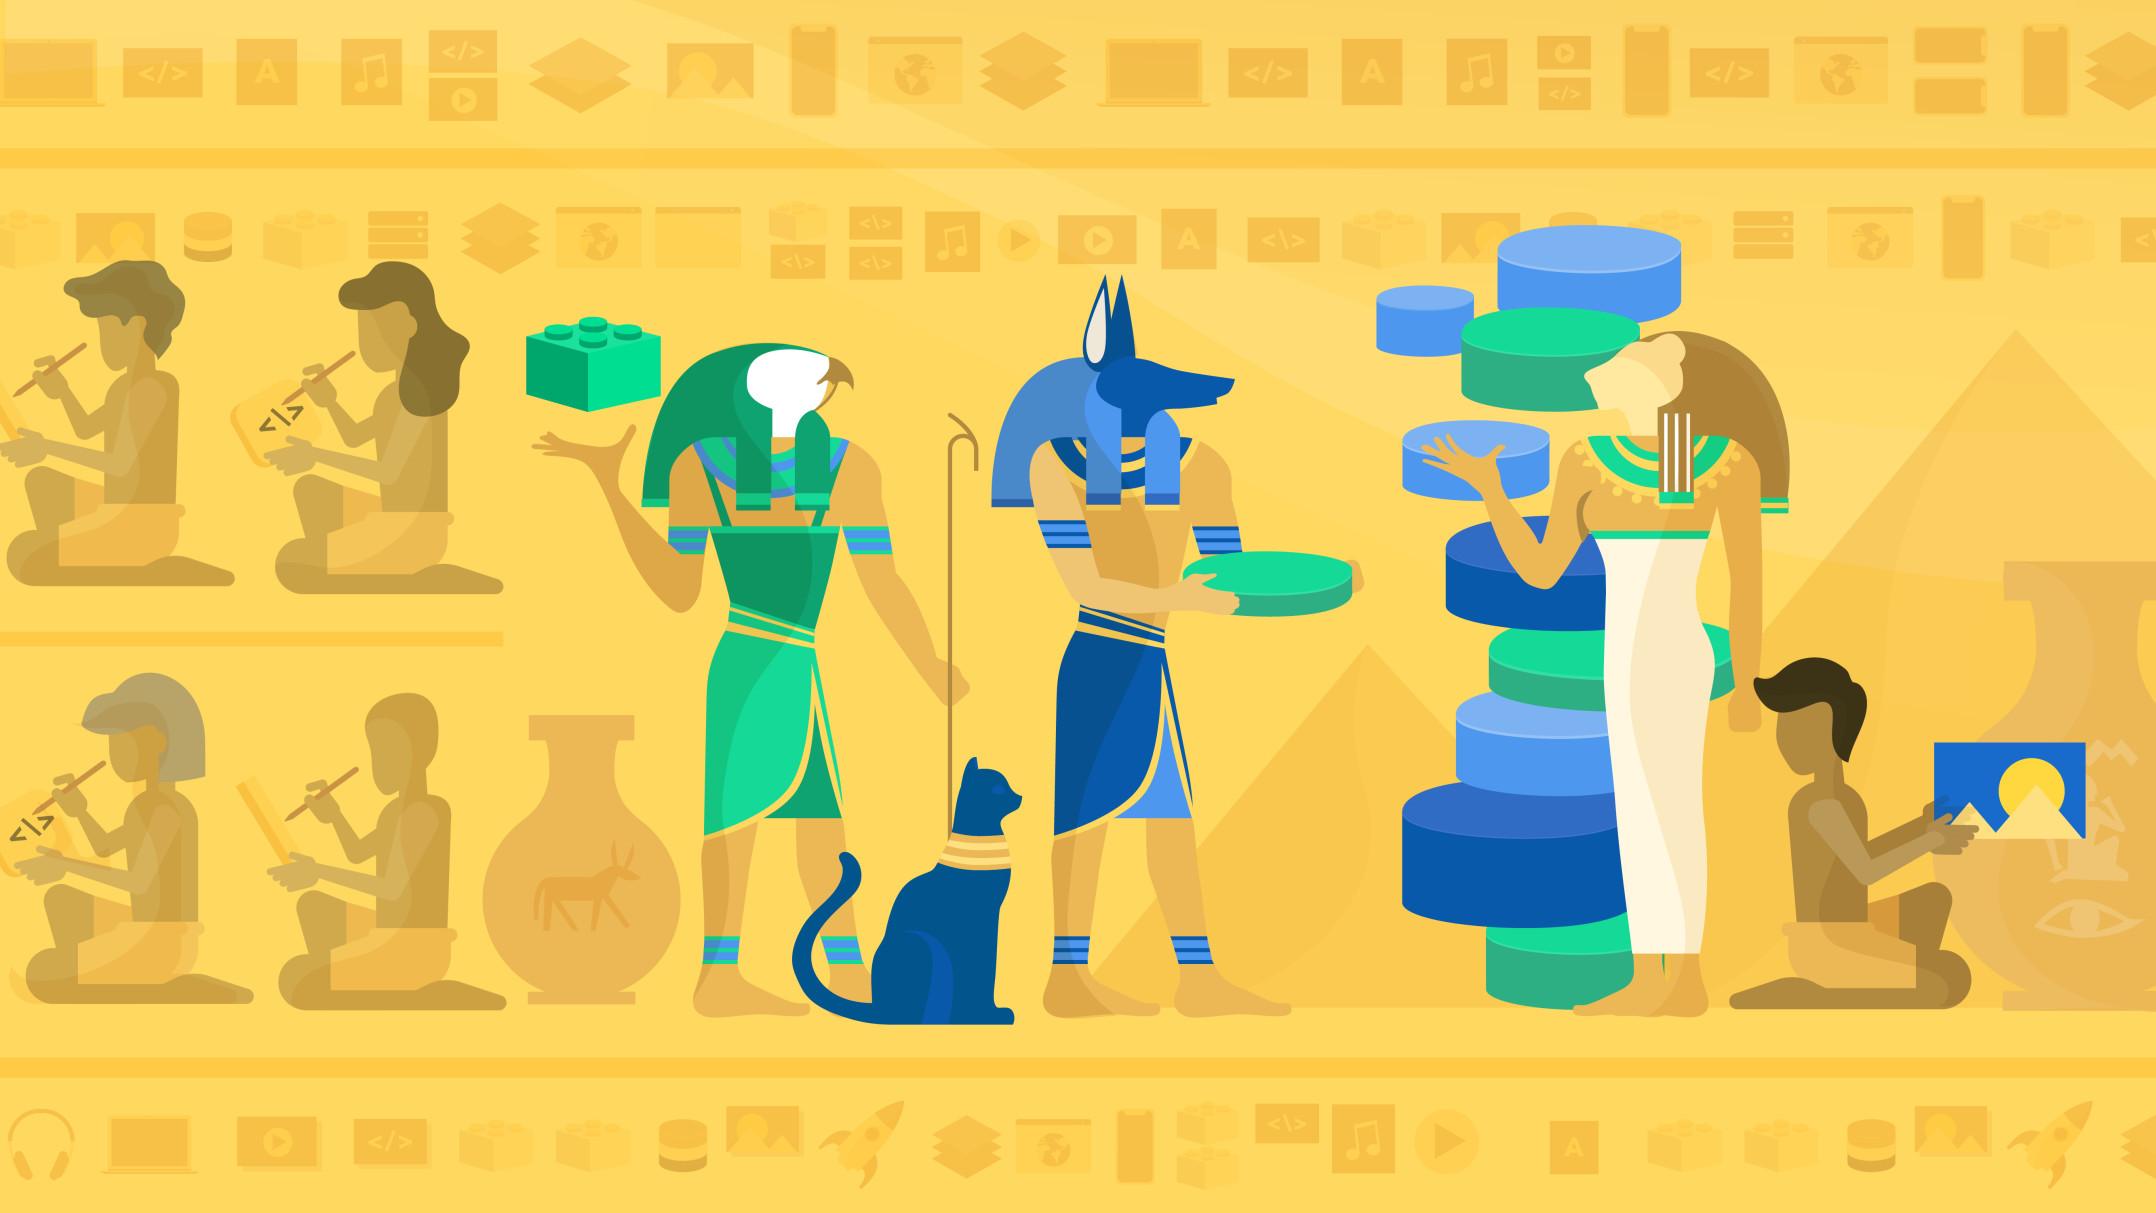 Egyptian hieroglyphics representing history of CMS building